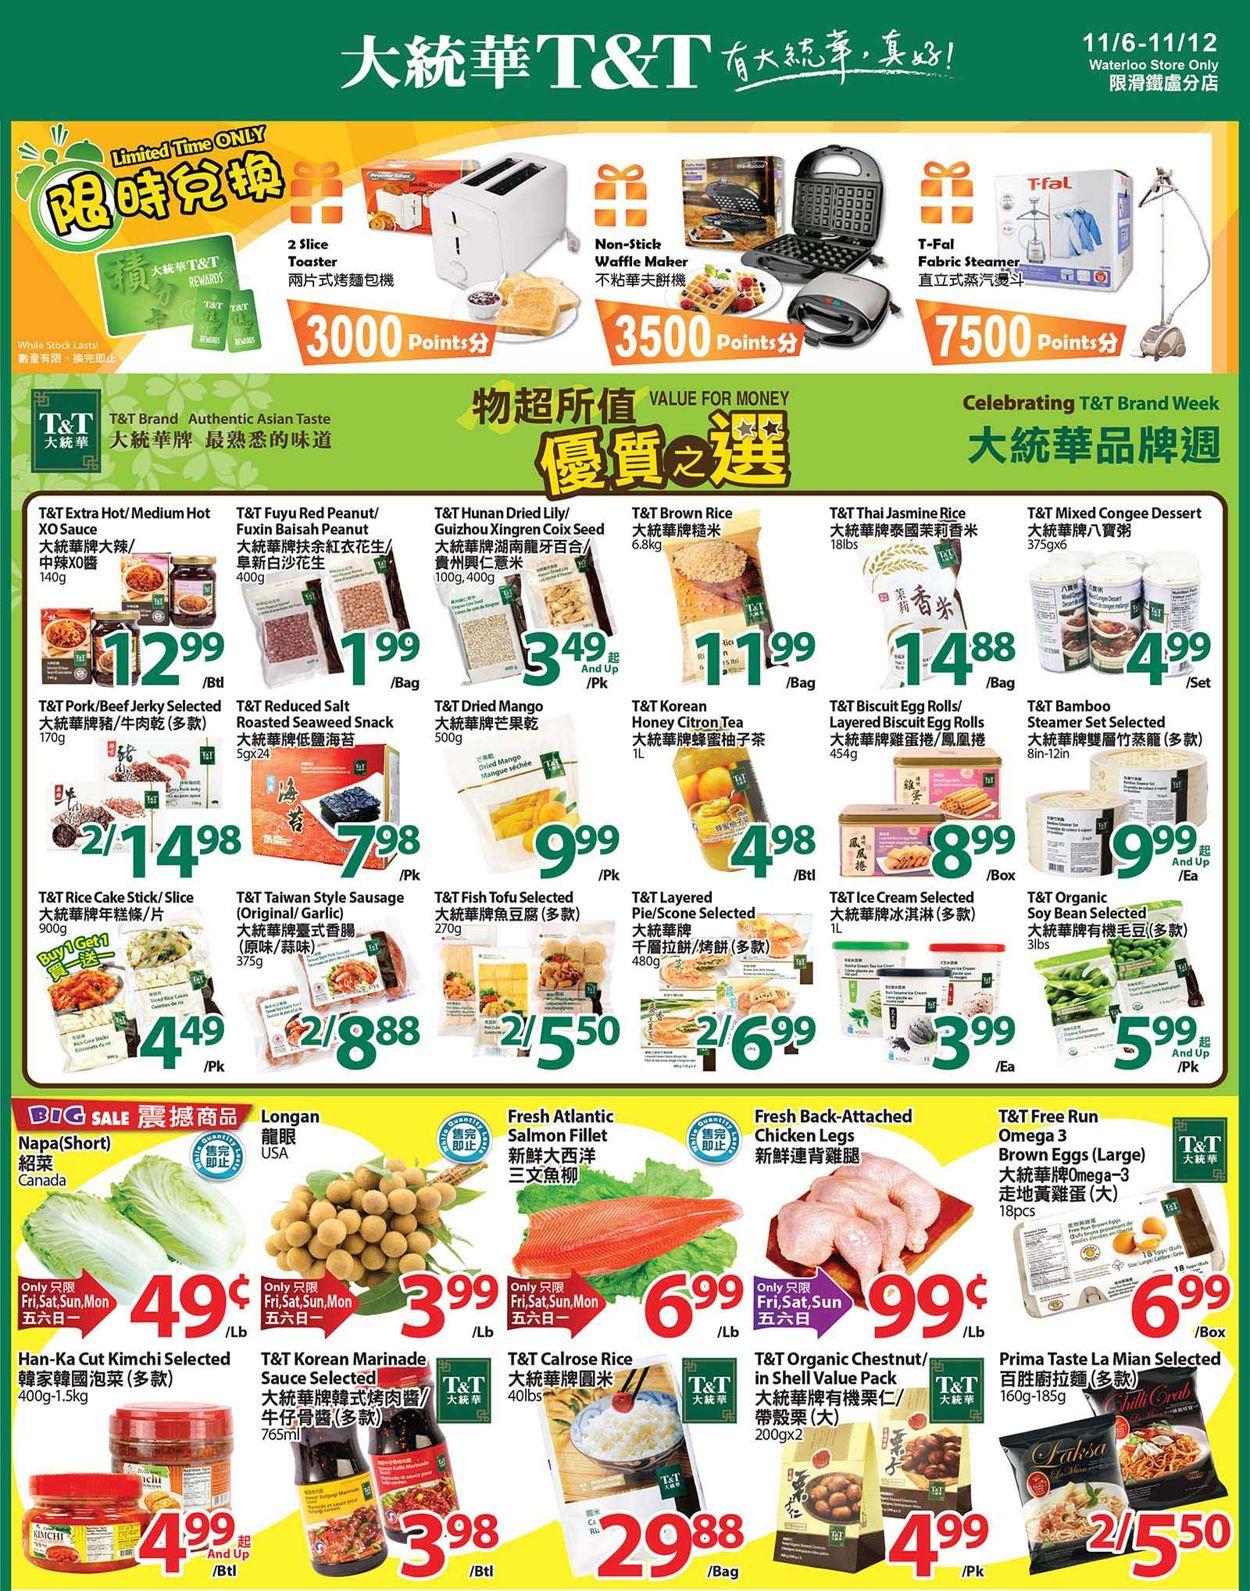 T&T Supermarket - Waterloo Flyer - 11/06-11/12/2020